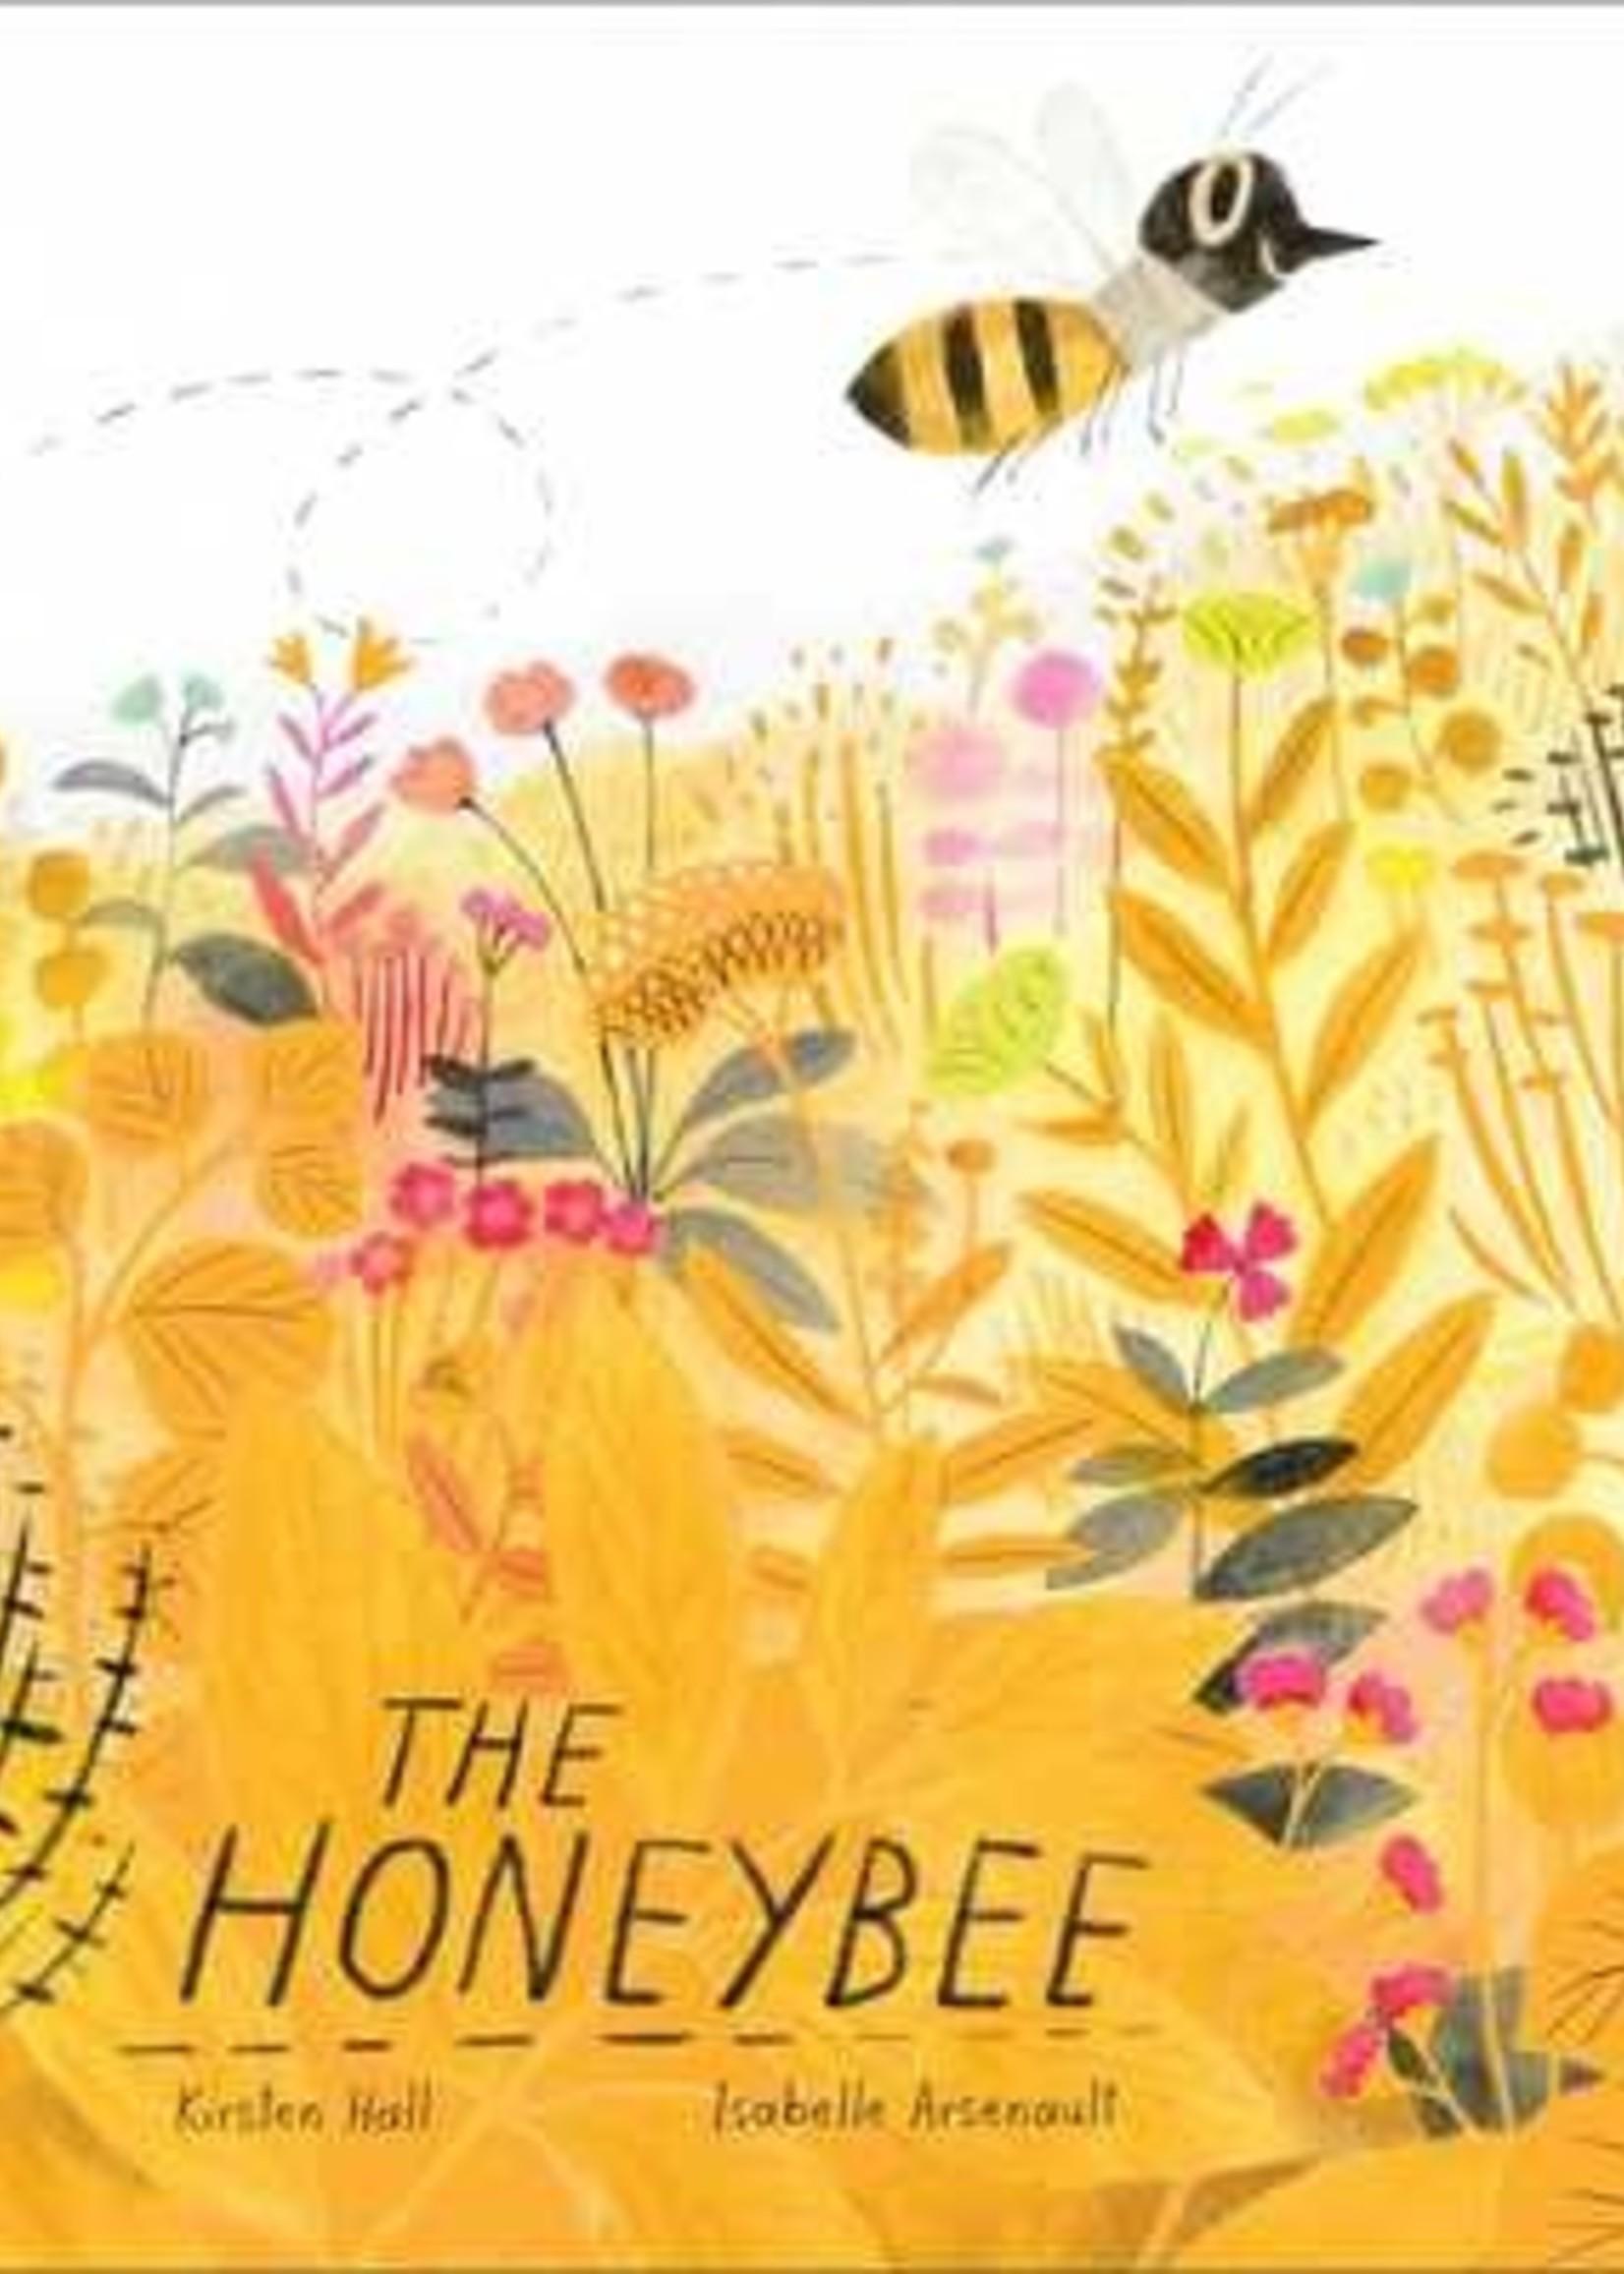 The Honeybee by Kirsten Hall,  Isabelle Arsenault